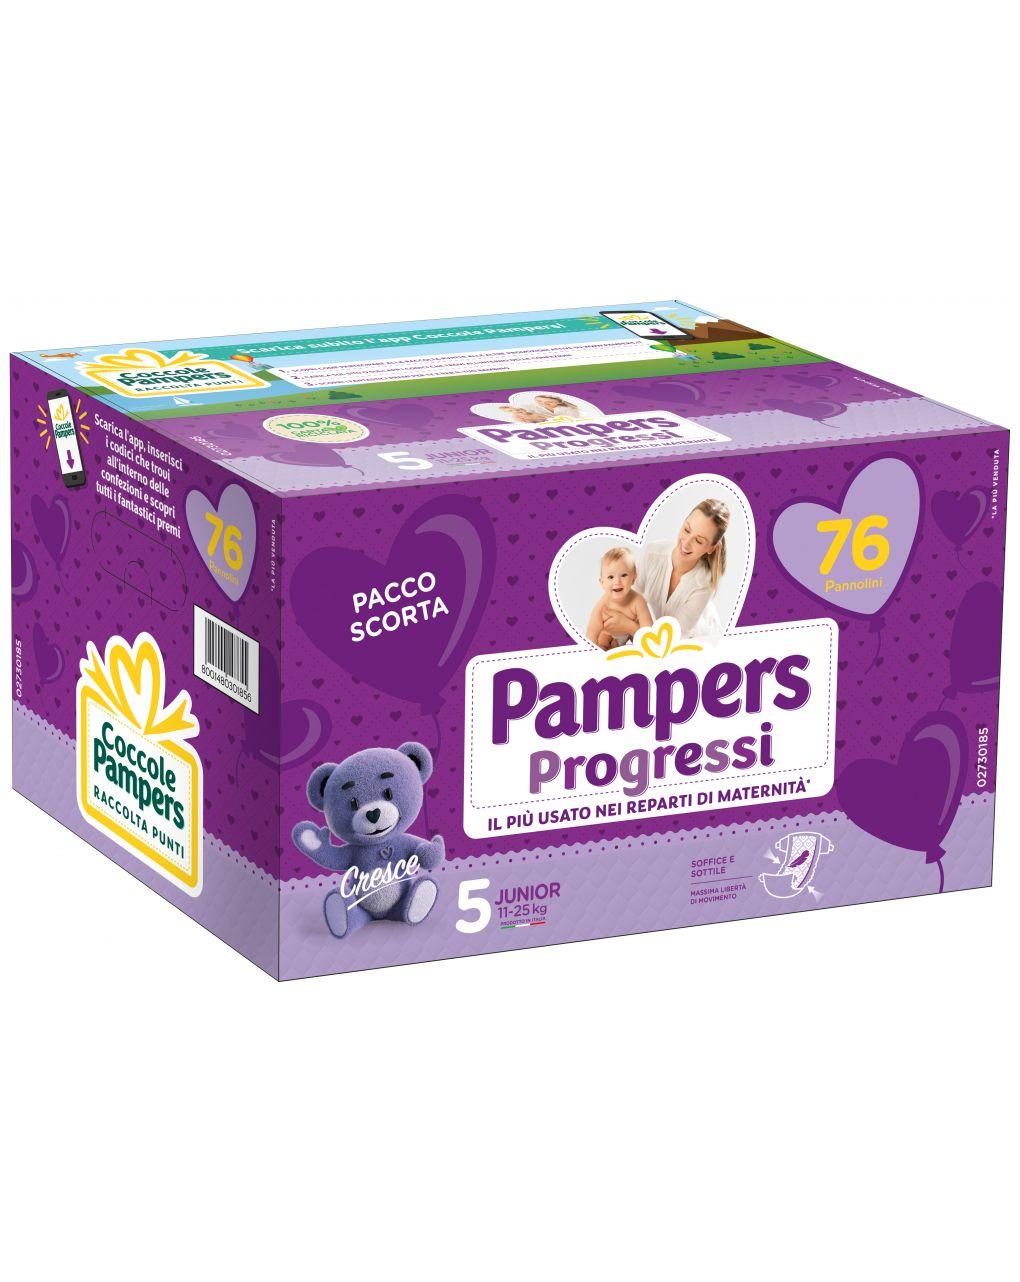 Pannolini quadri progressi tg. 5 (76 pz) - Pampers